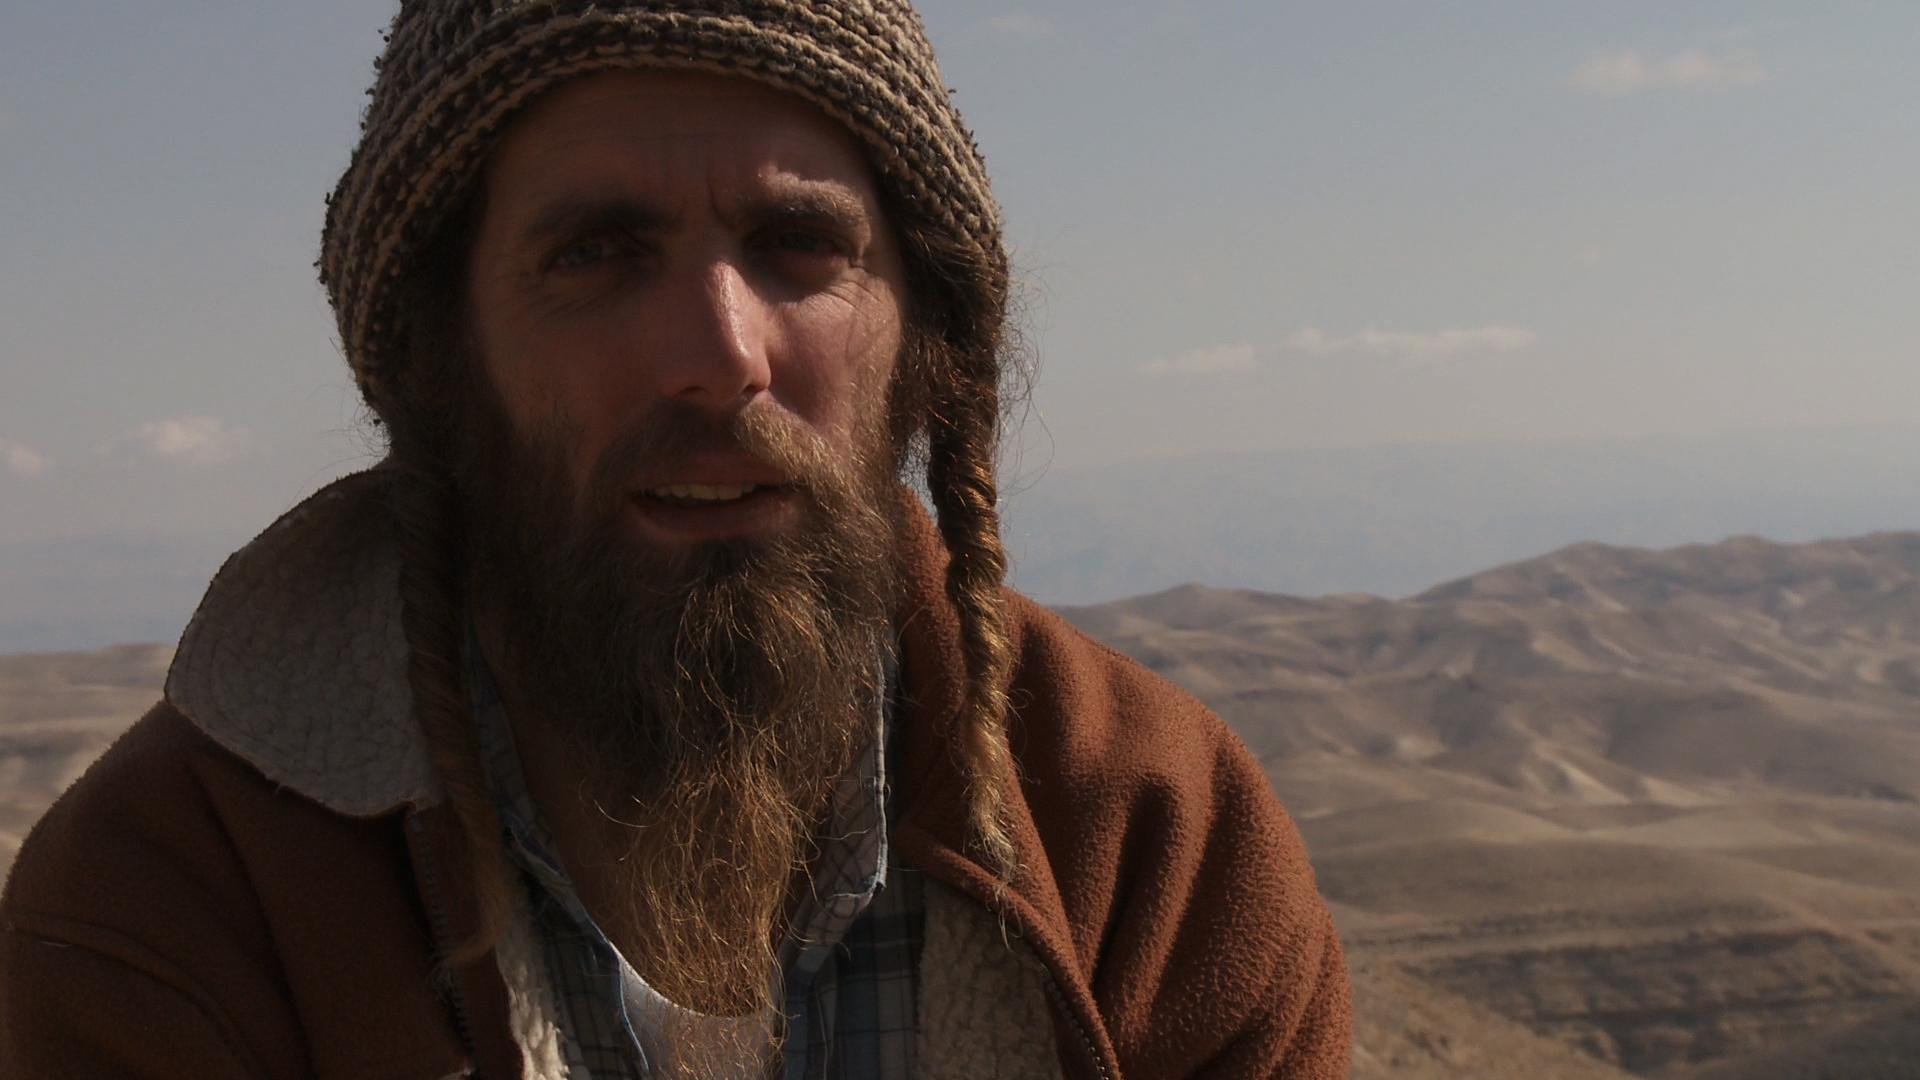 Httpwww Overlordsofchaos Comhtmlorigin Of The Word Jew Html: UK Jewish Film